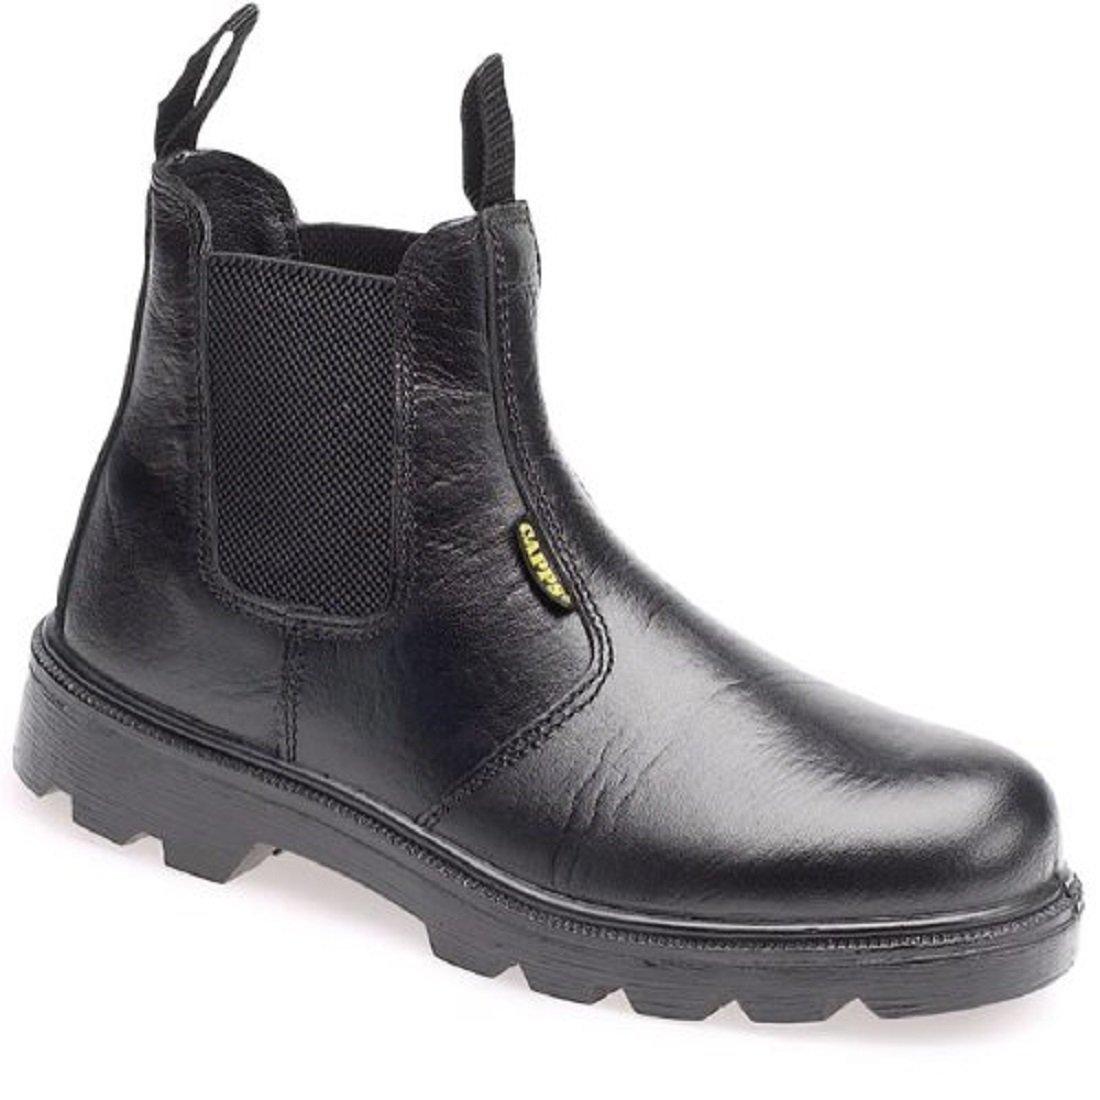 Blackrock Dealer Boots Steel Toe Cap Black Leather Chelsea Safety Work SF12B